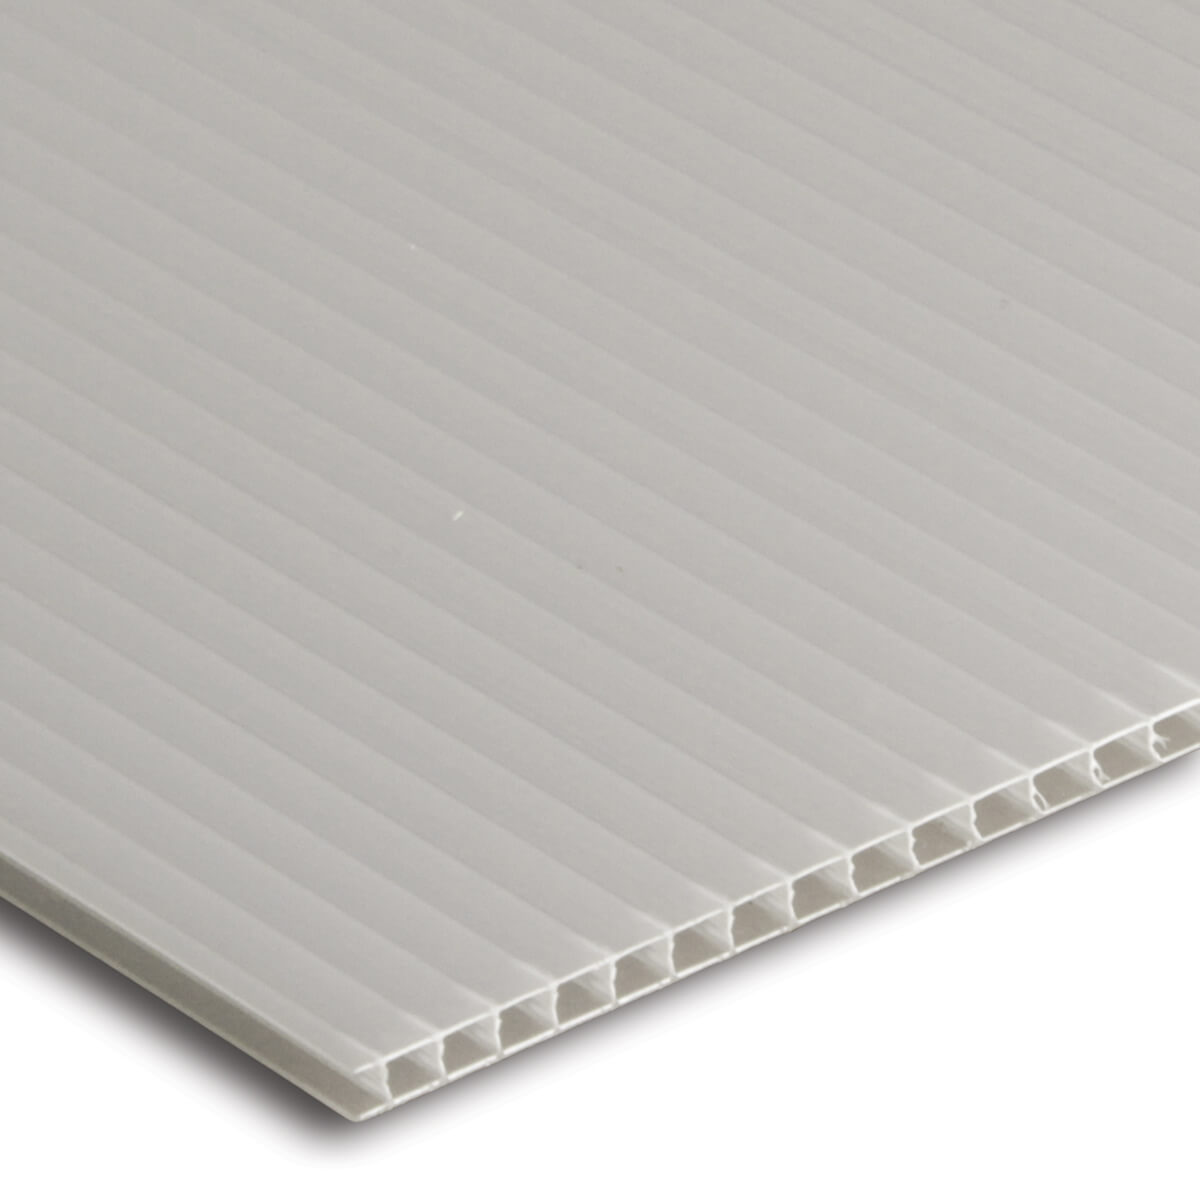 Coroplast Acid Free Corrugated Plastic Sheets Talas